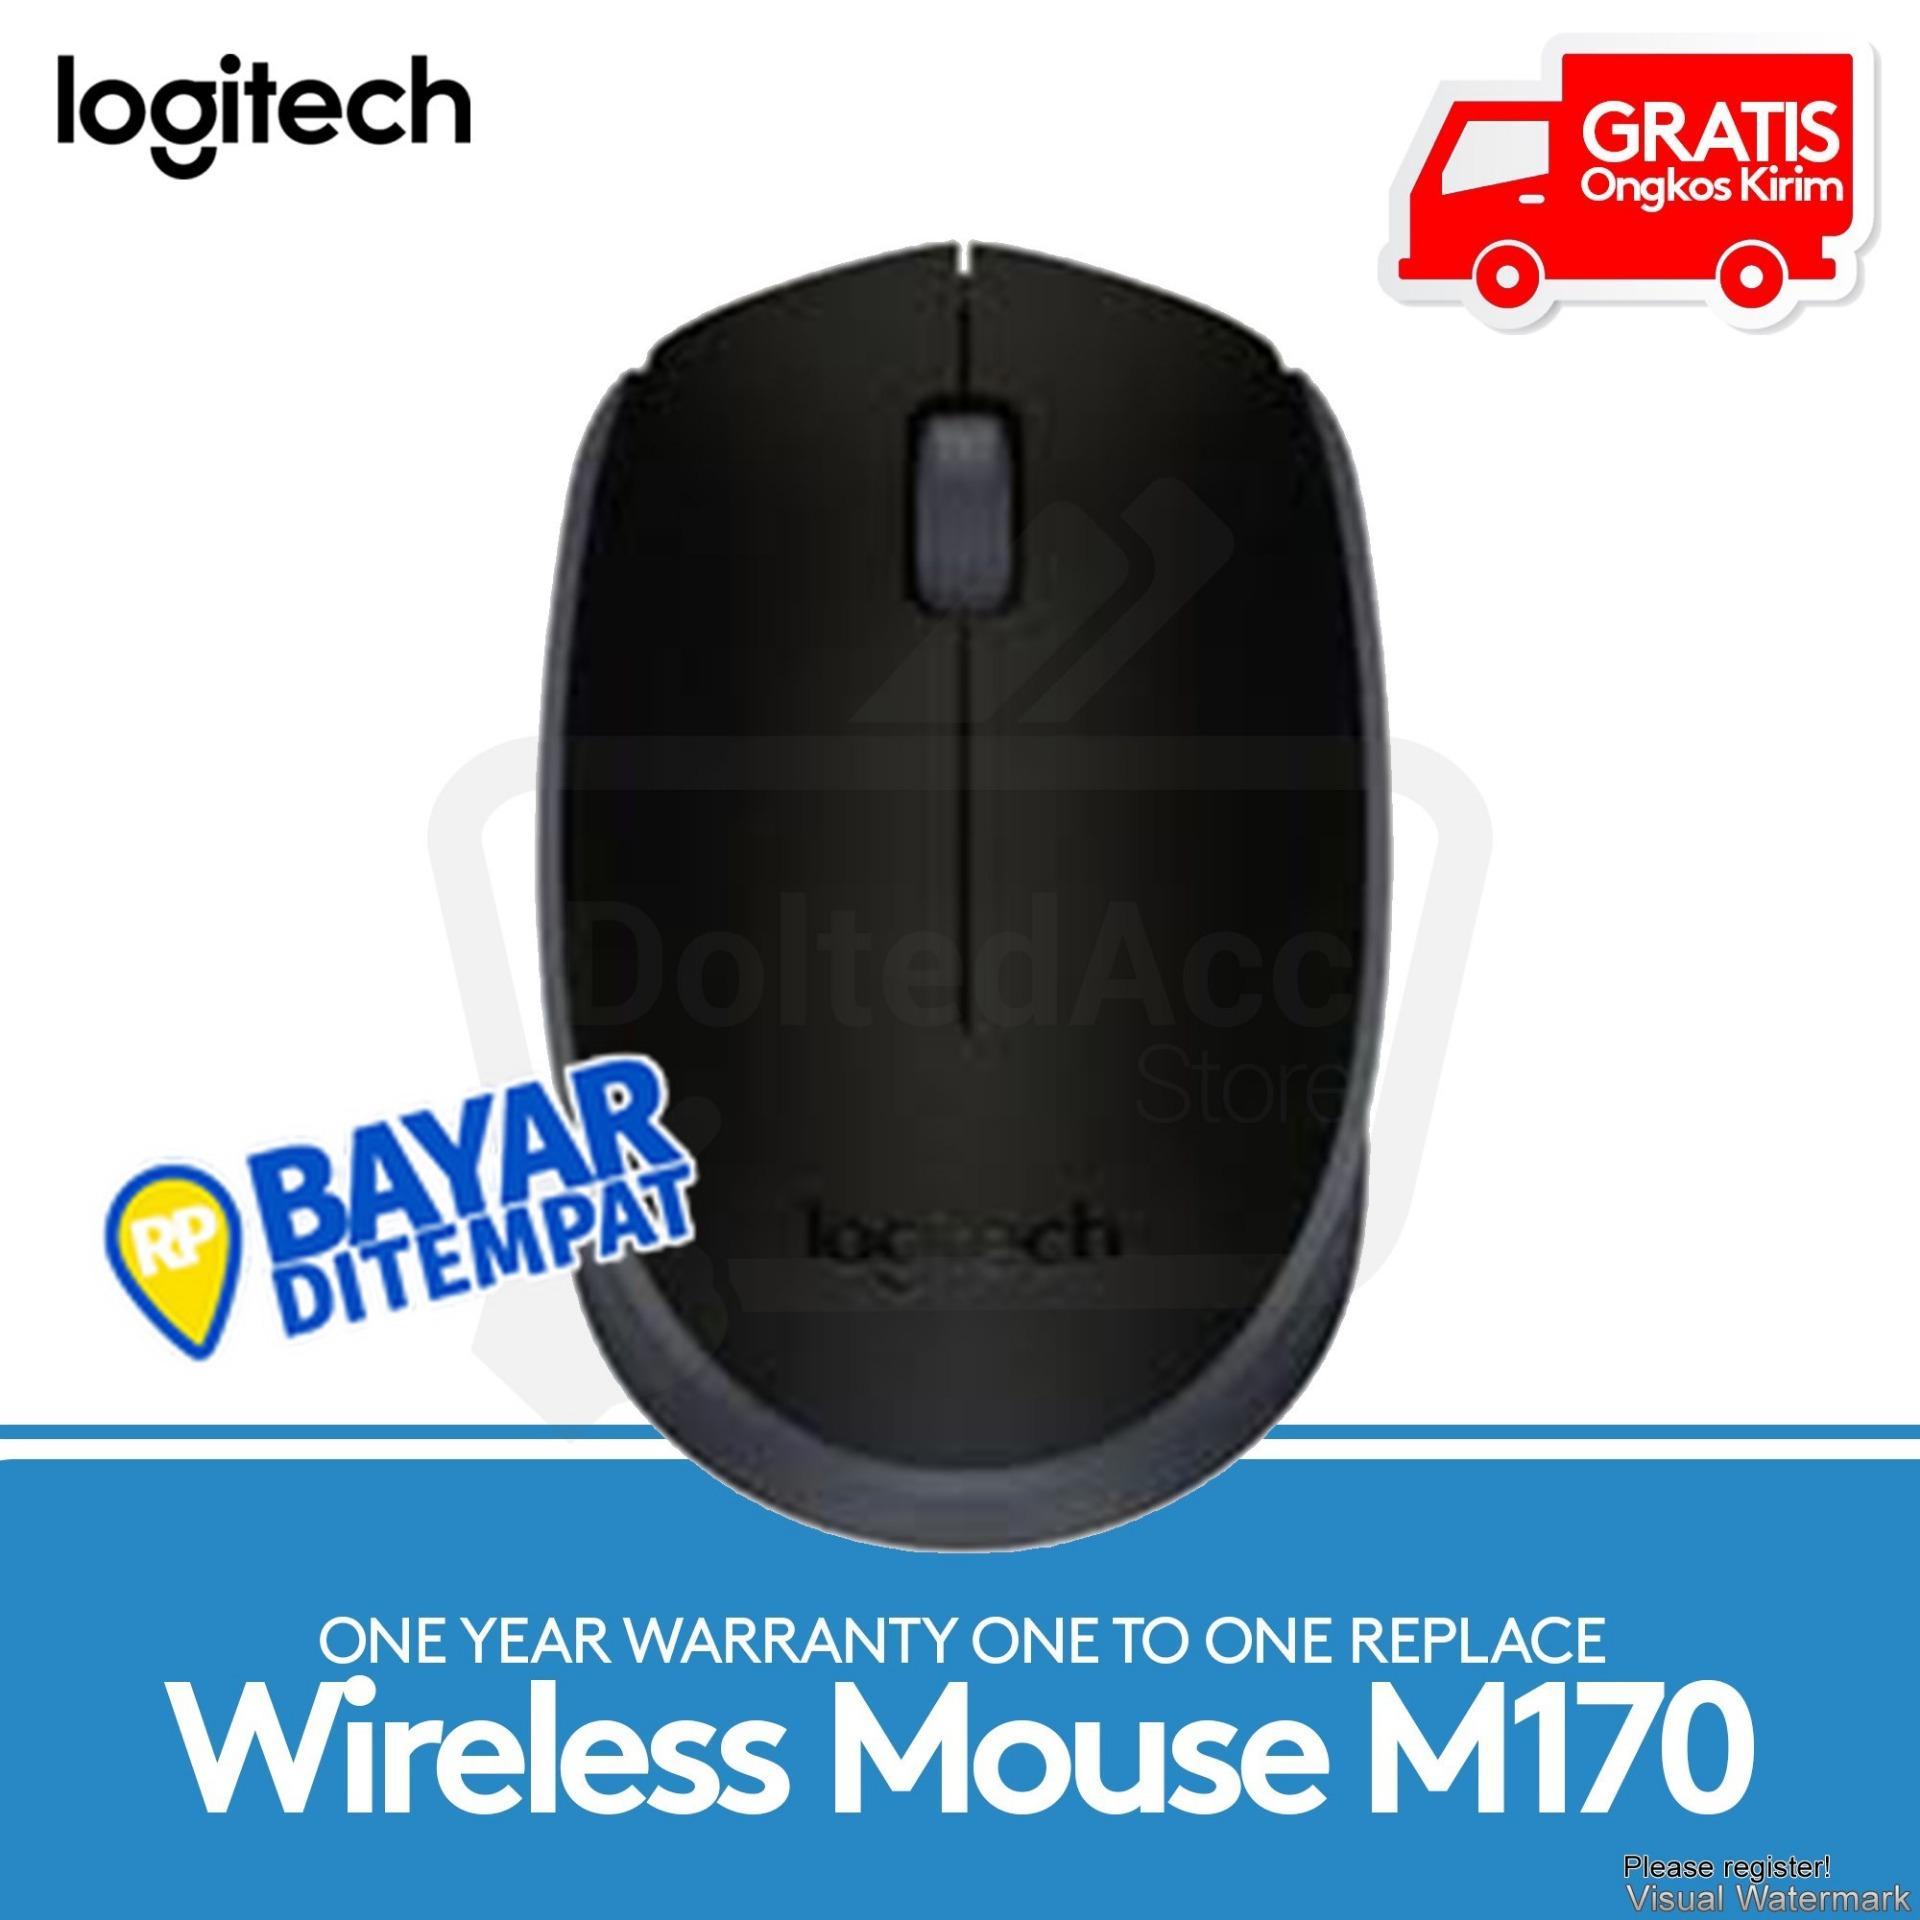 Logitech M170 Wireless Mouse Gratis Mousepad Bantal Daftar Harga